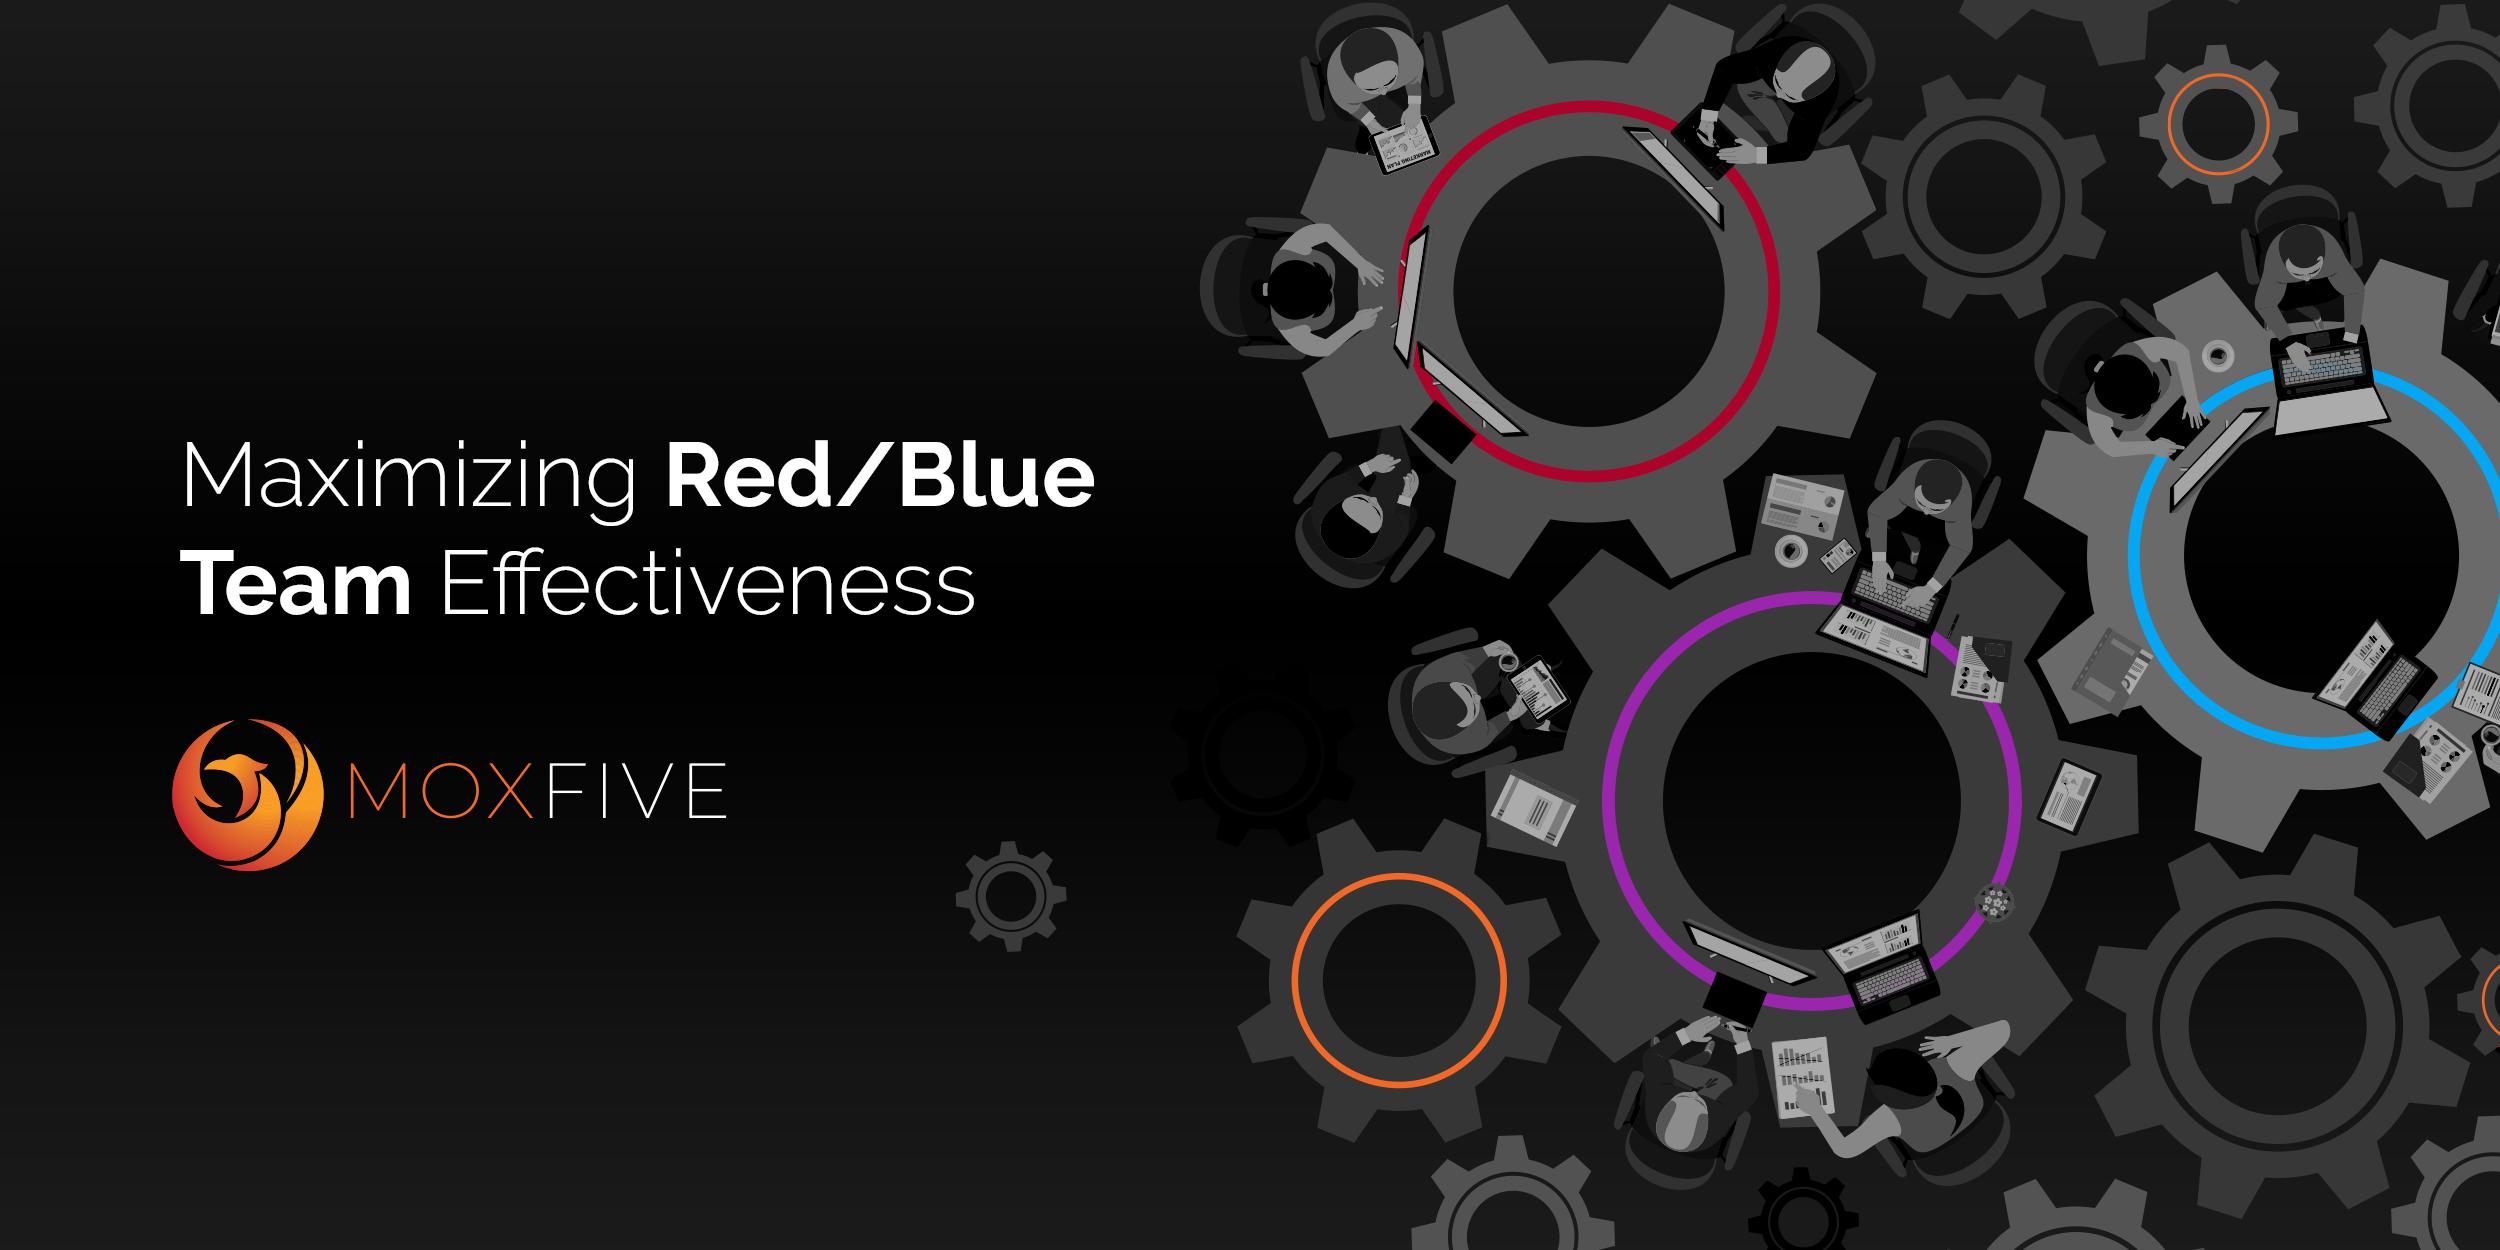 Maximizing Red/Blue Team Effectiveness